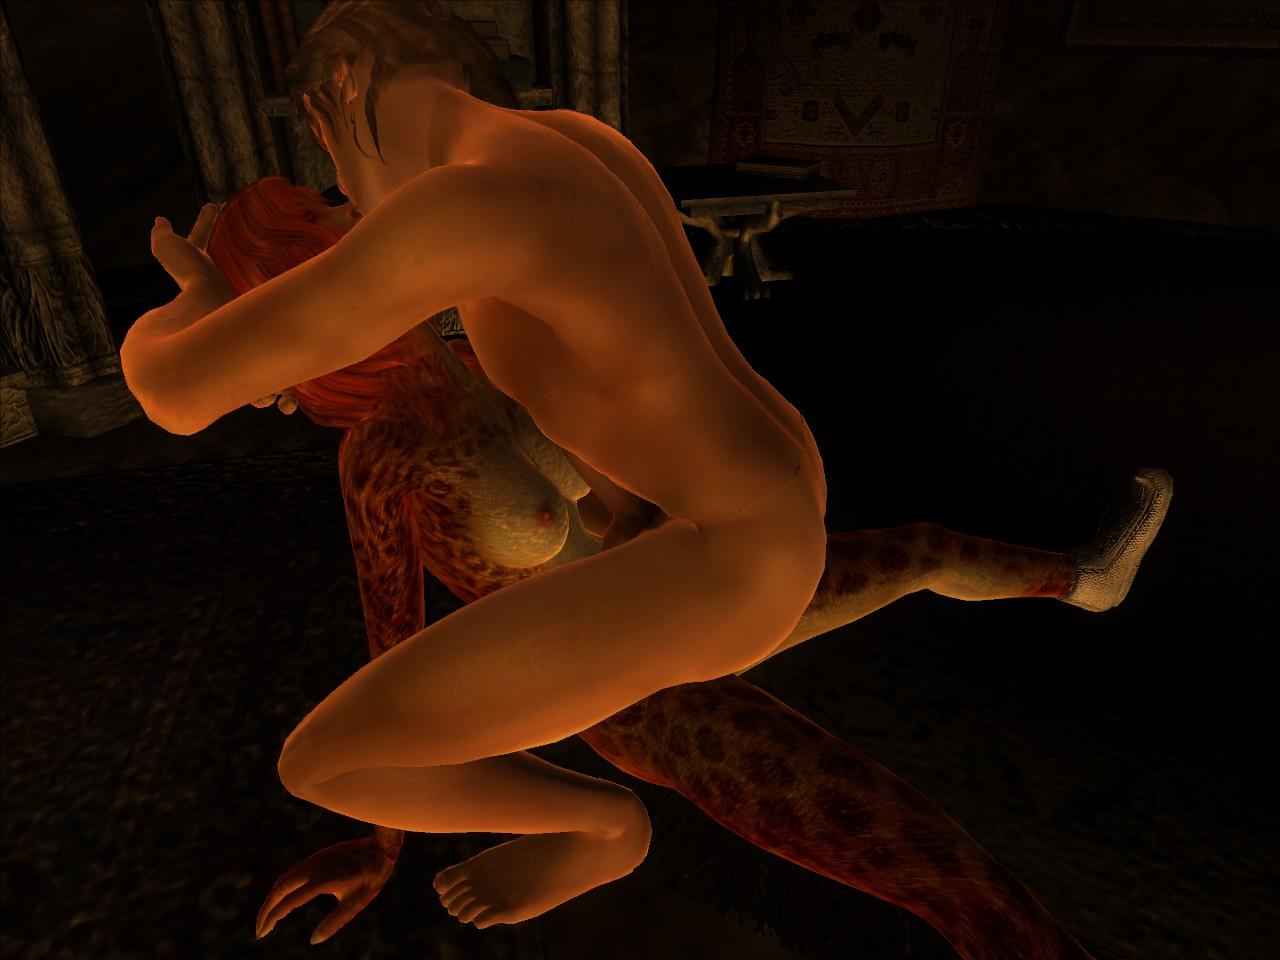 Khajiit nude mod pics nackt scenes